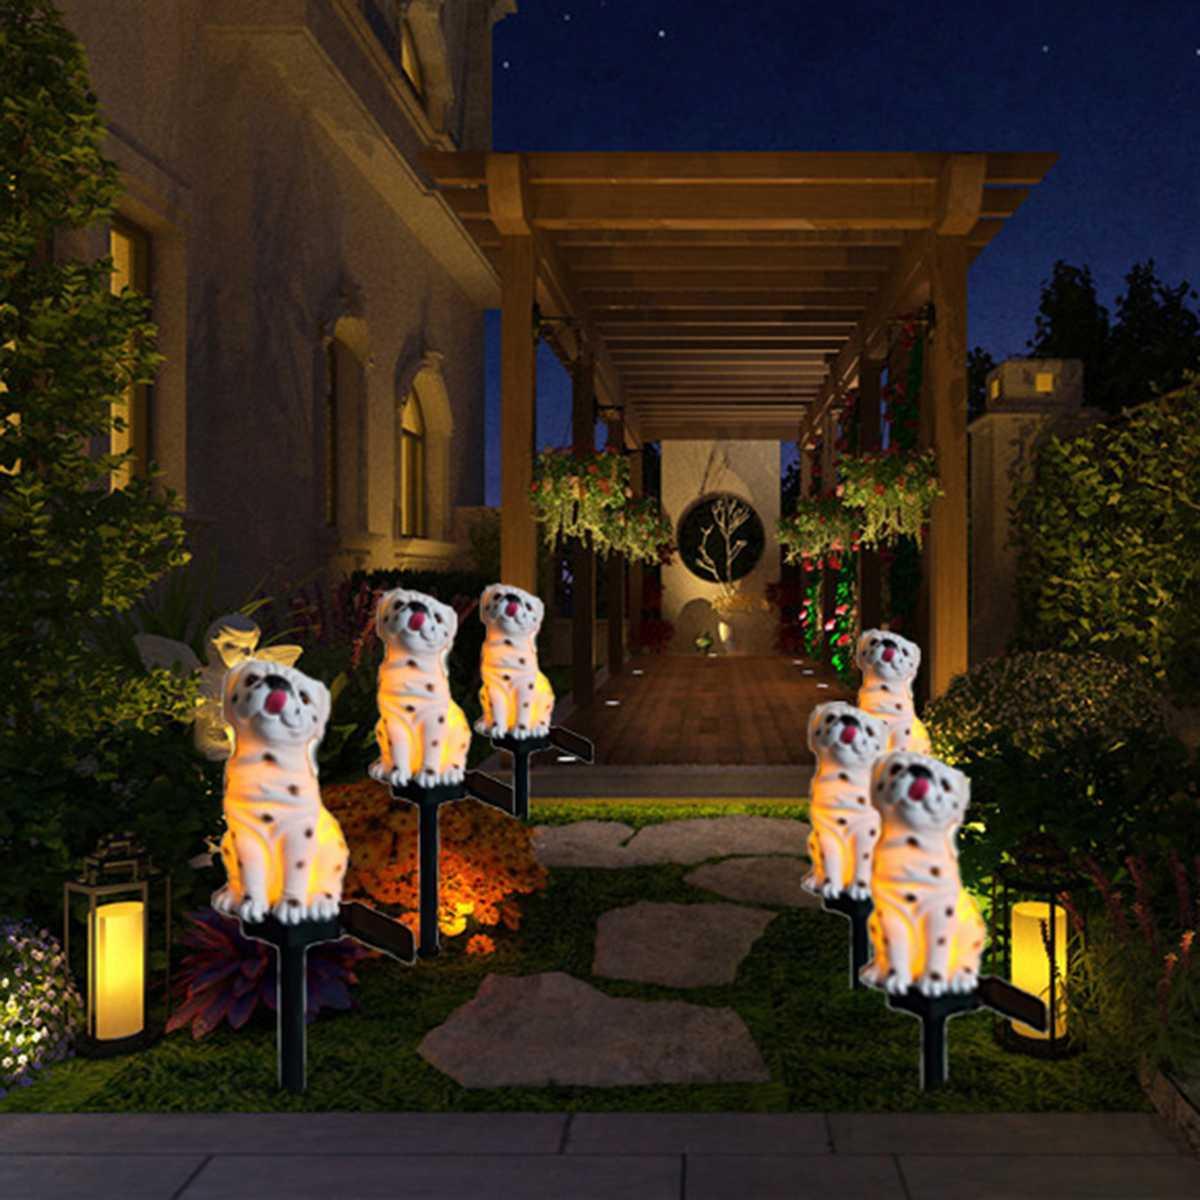 Novelty Outdoor Solar Garden Lights LED 3D Animal Bird Ornament Yard Lamp Decor